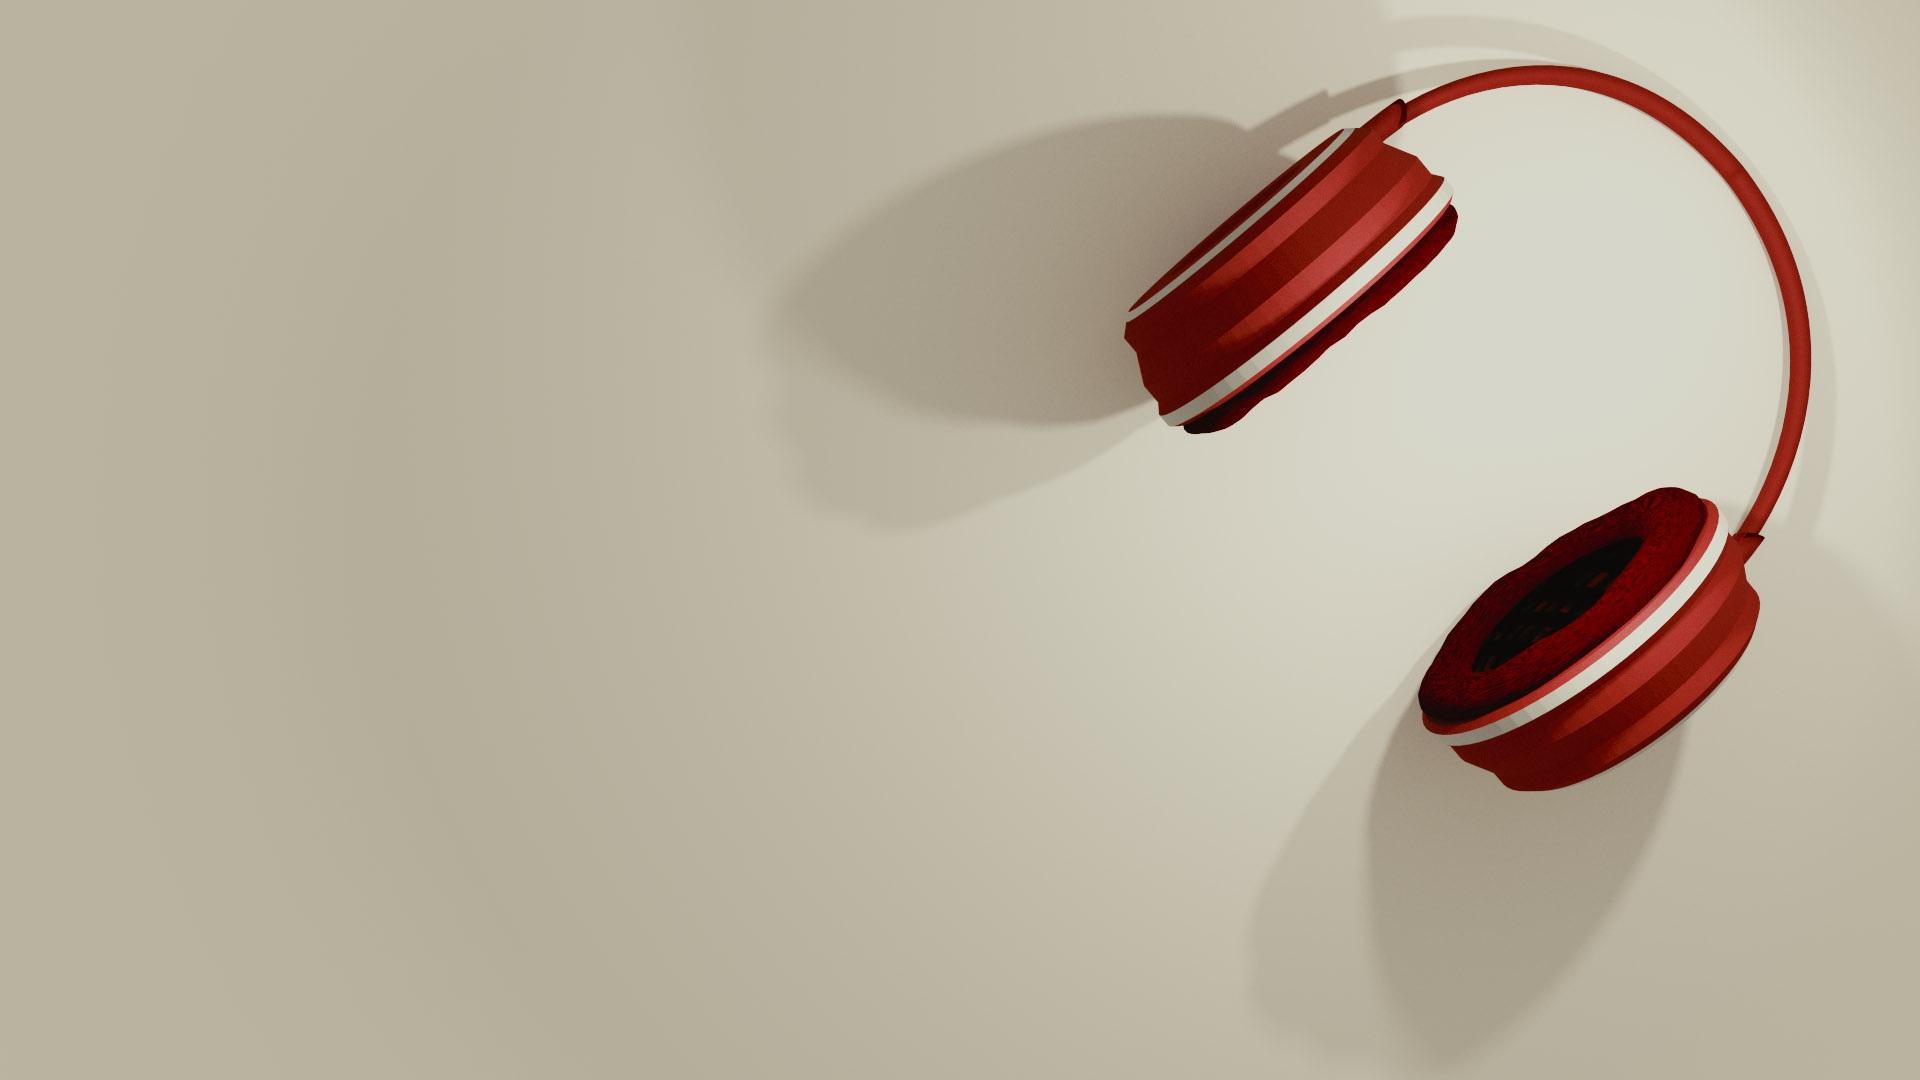 Kopfhörer für Sport